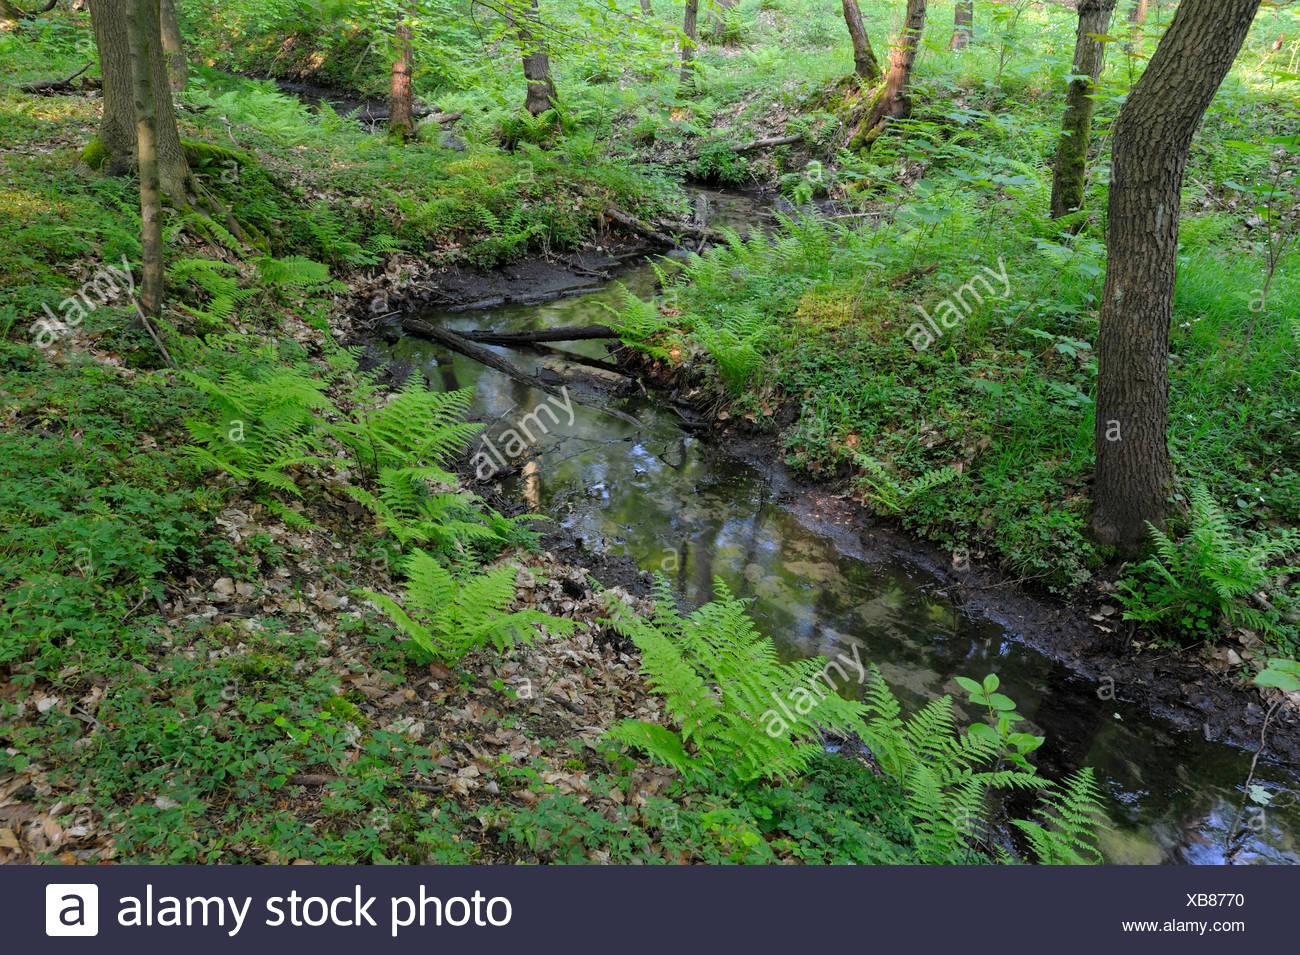 Brook in beech forest, Bottrop, North Rhine-Westphalia, Germany - Stock Image